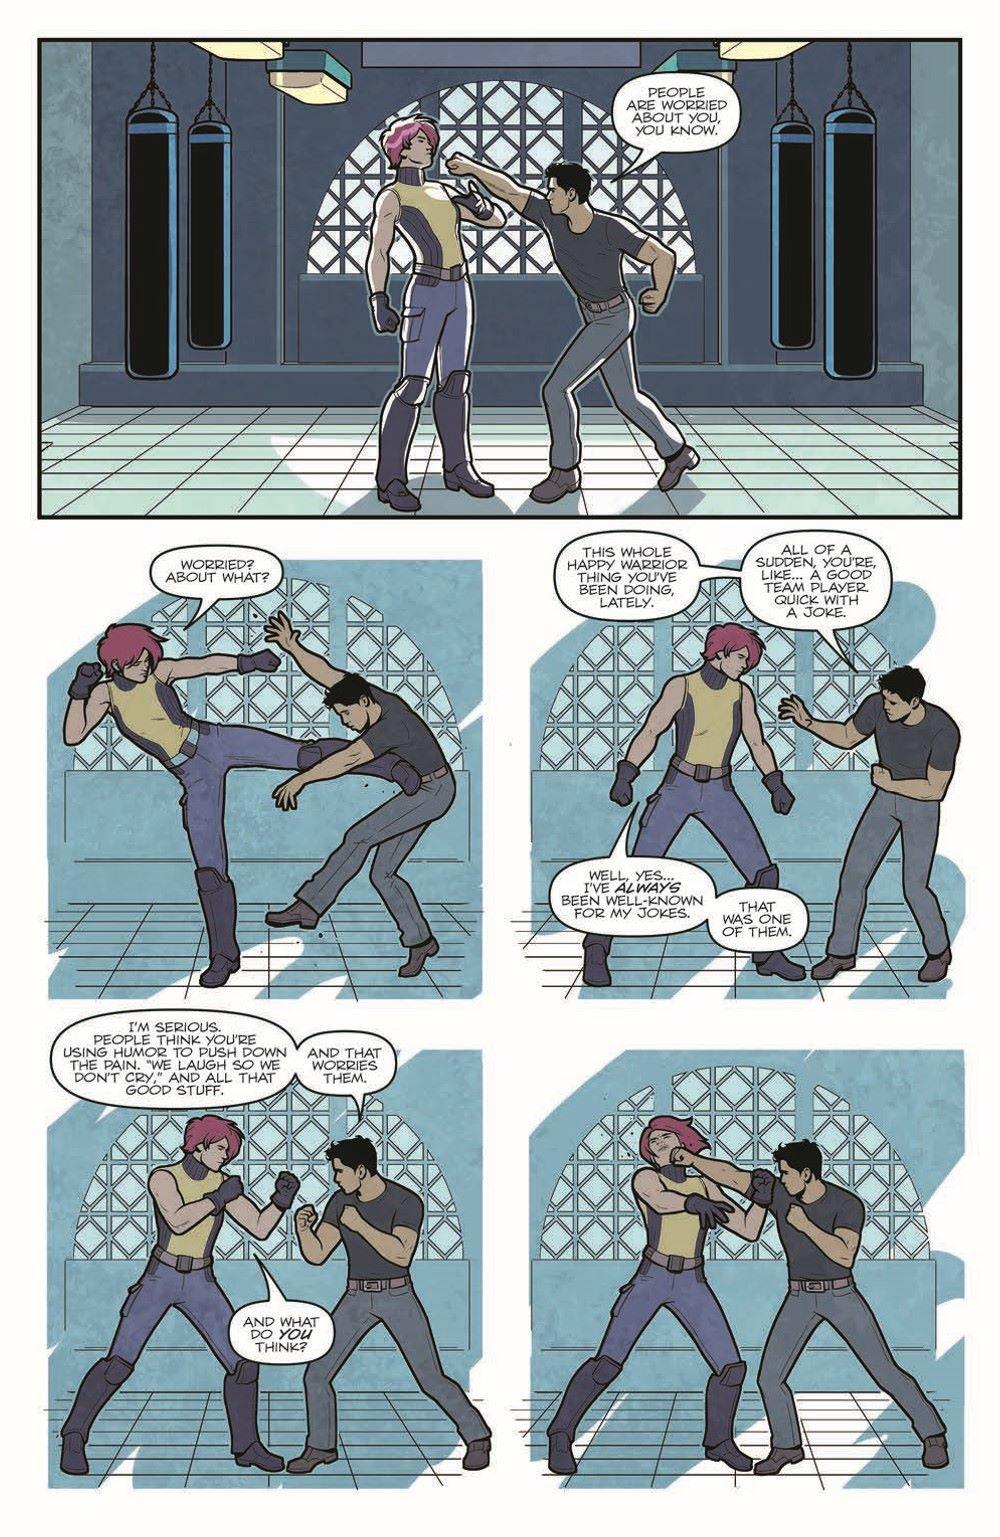 GIJoe_CastleFall-pr-3 ComicList Previews: G.I. JOE CASTLE FALL #1